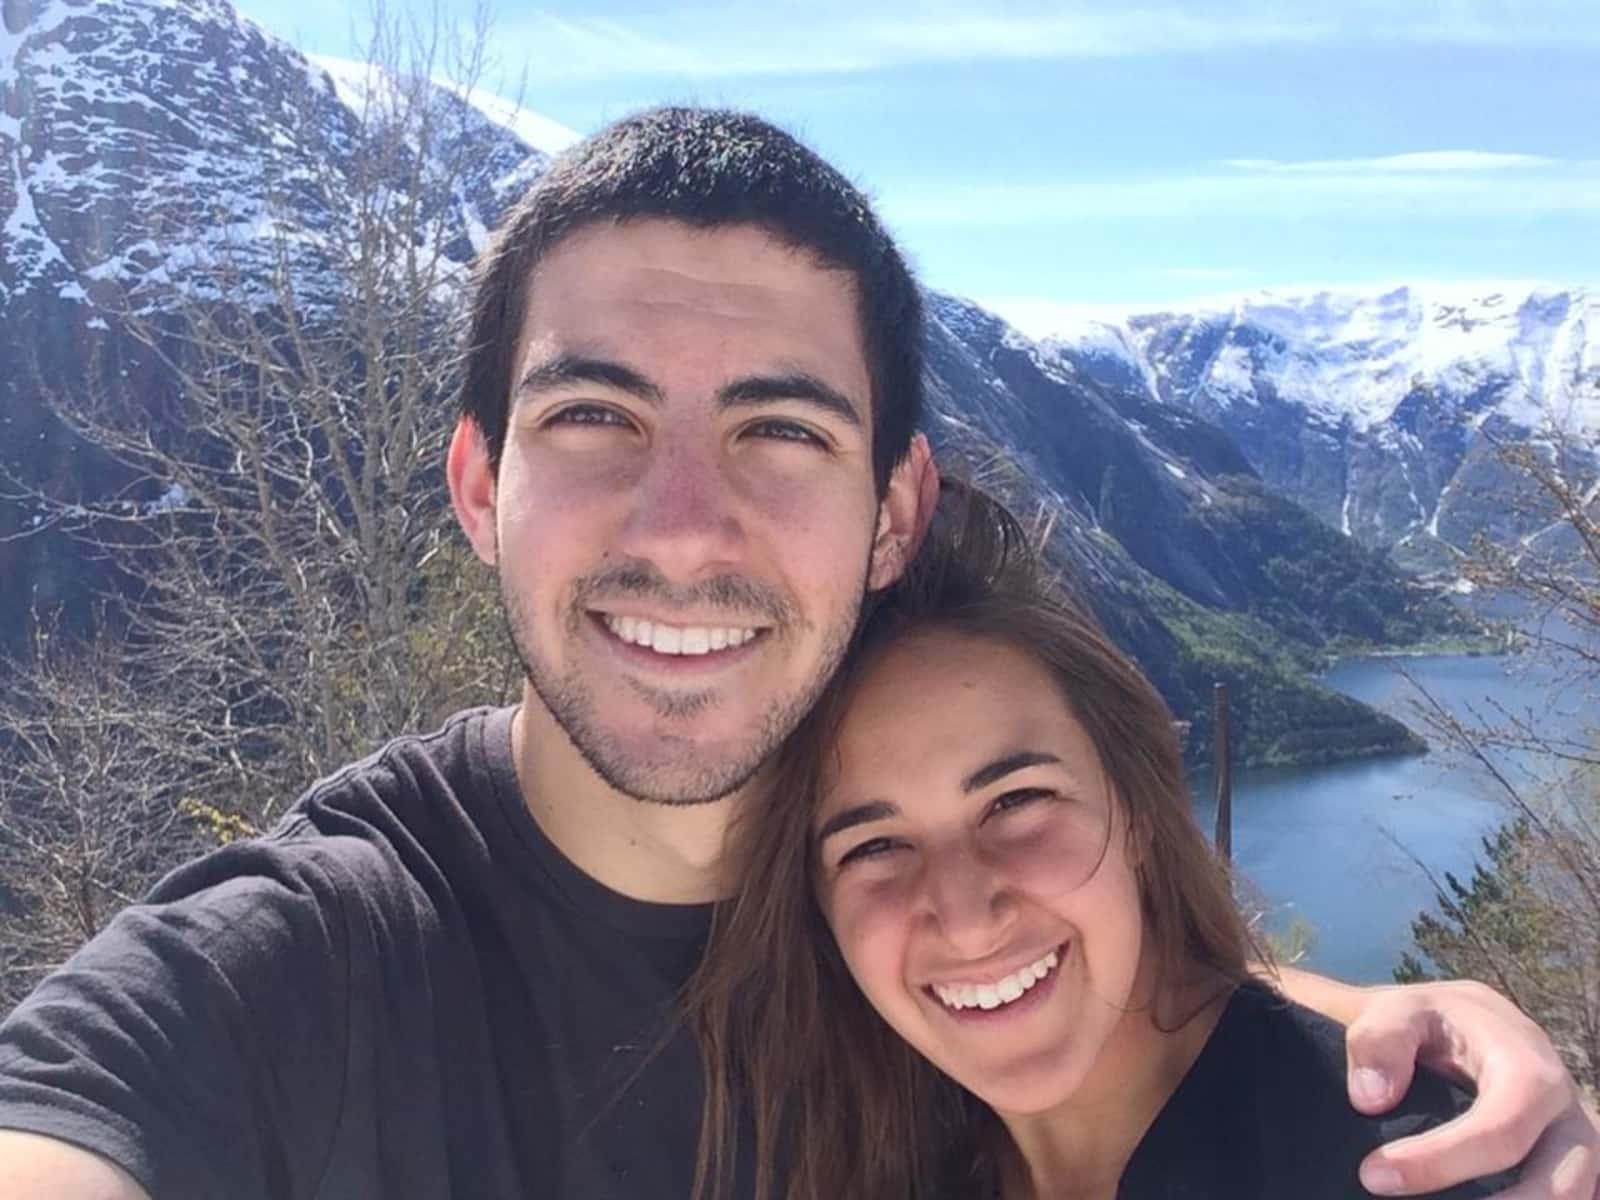 Alexandra & Nadav from Asheville, North Carolina, United States